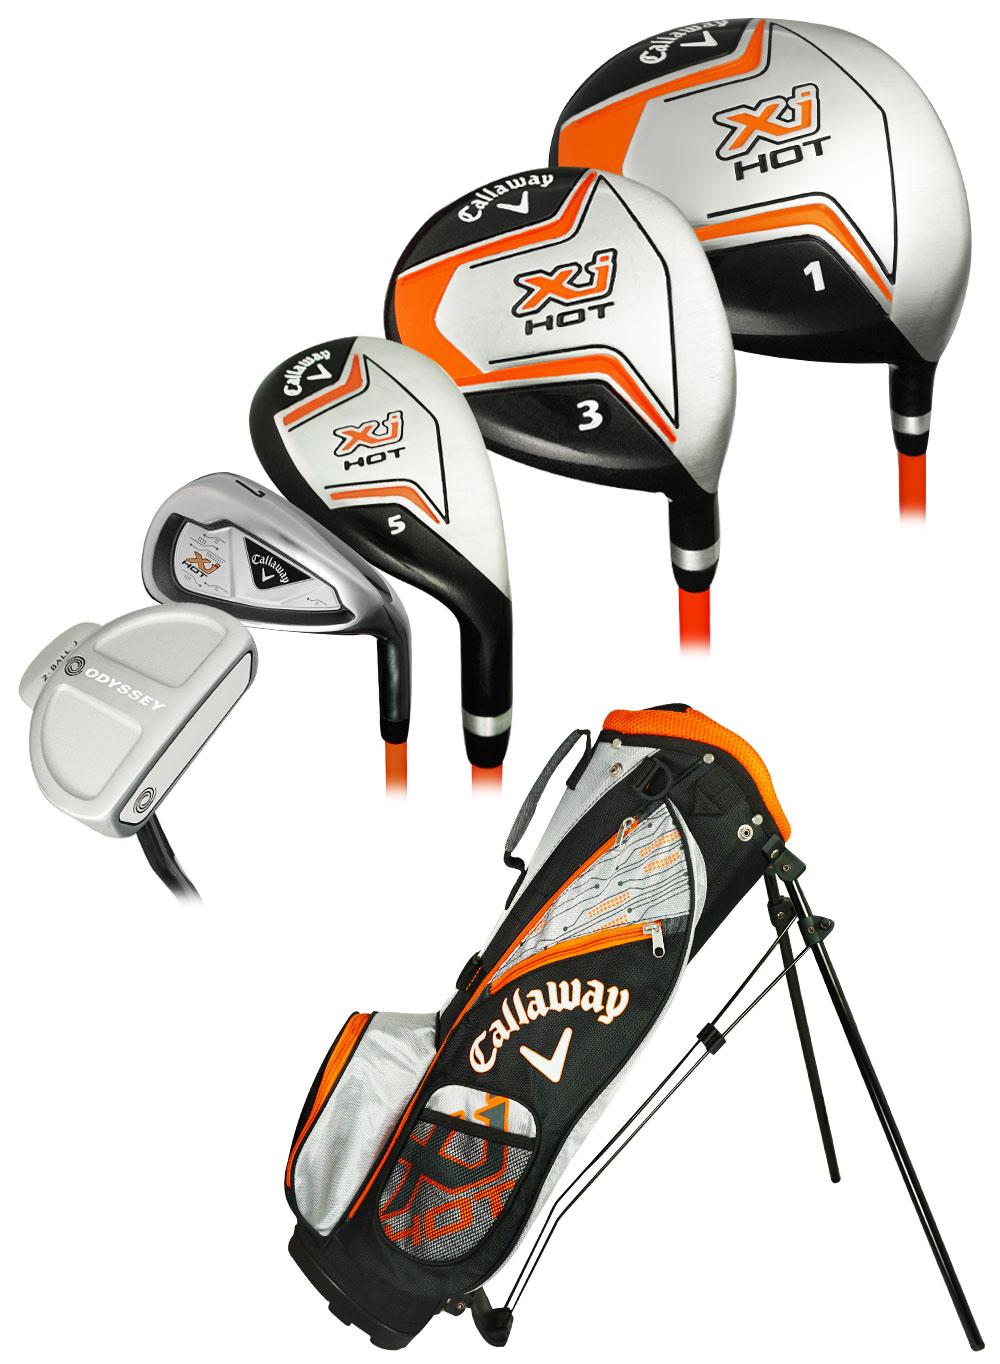 Callaway Golf XJ Hot Junior Boys 8-Piece Set Ages 5-8 Left